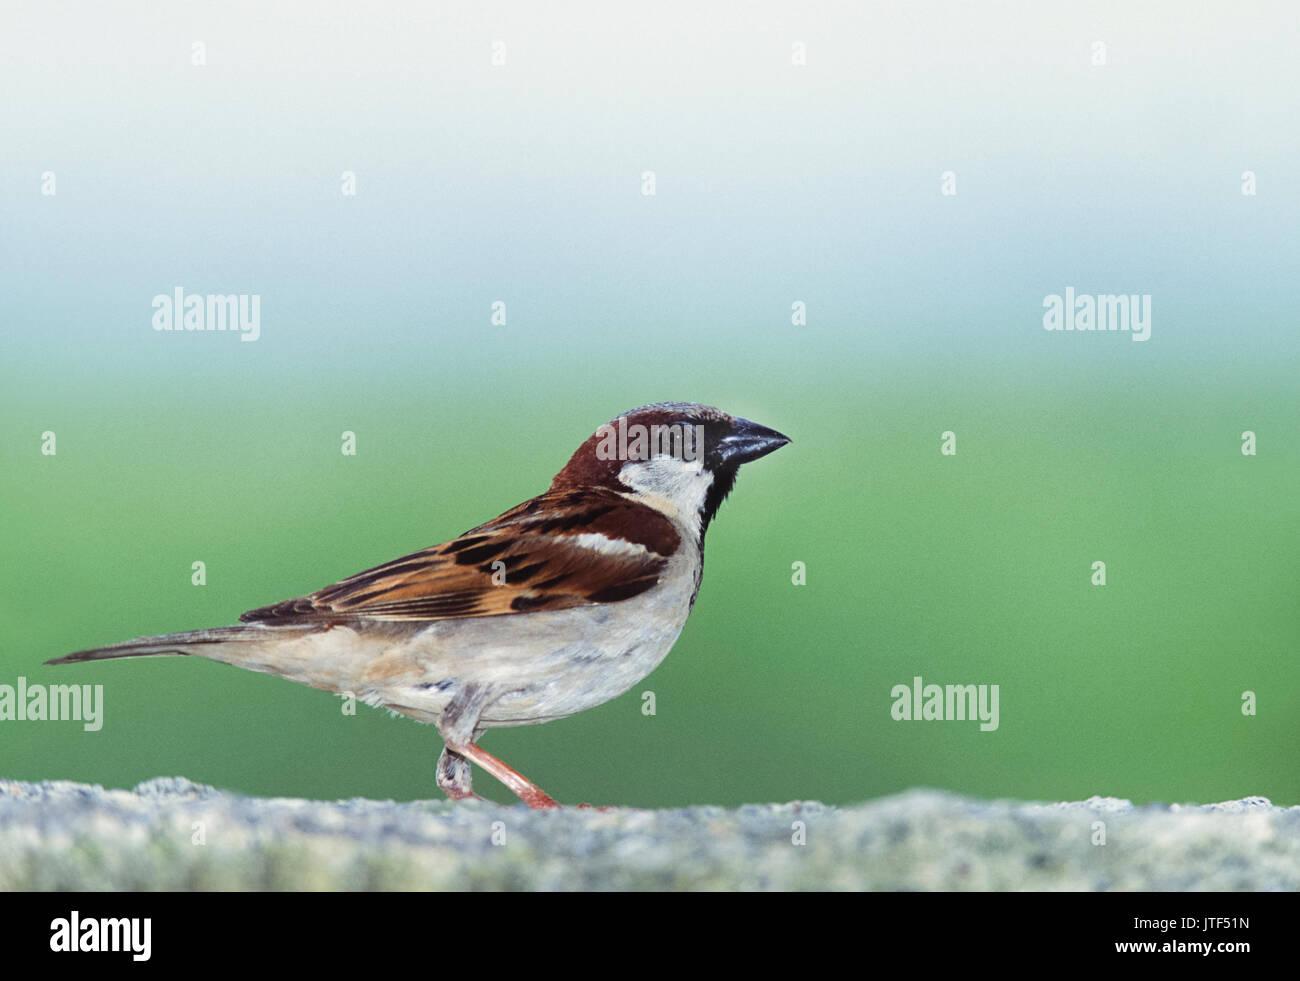 House sparrow, (Passer domesticus), Keoladeo Ghana National Park, Bharatpur, Rajasthan, India - Stock Image